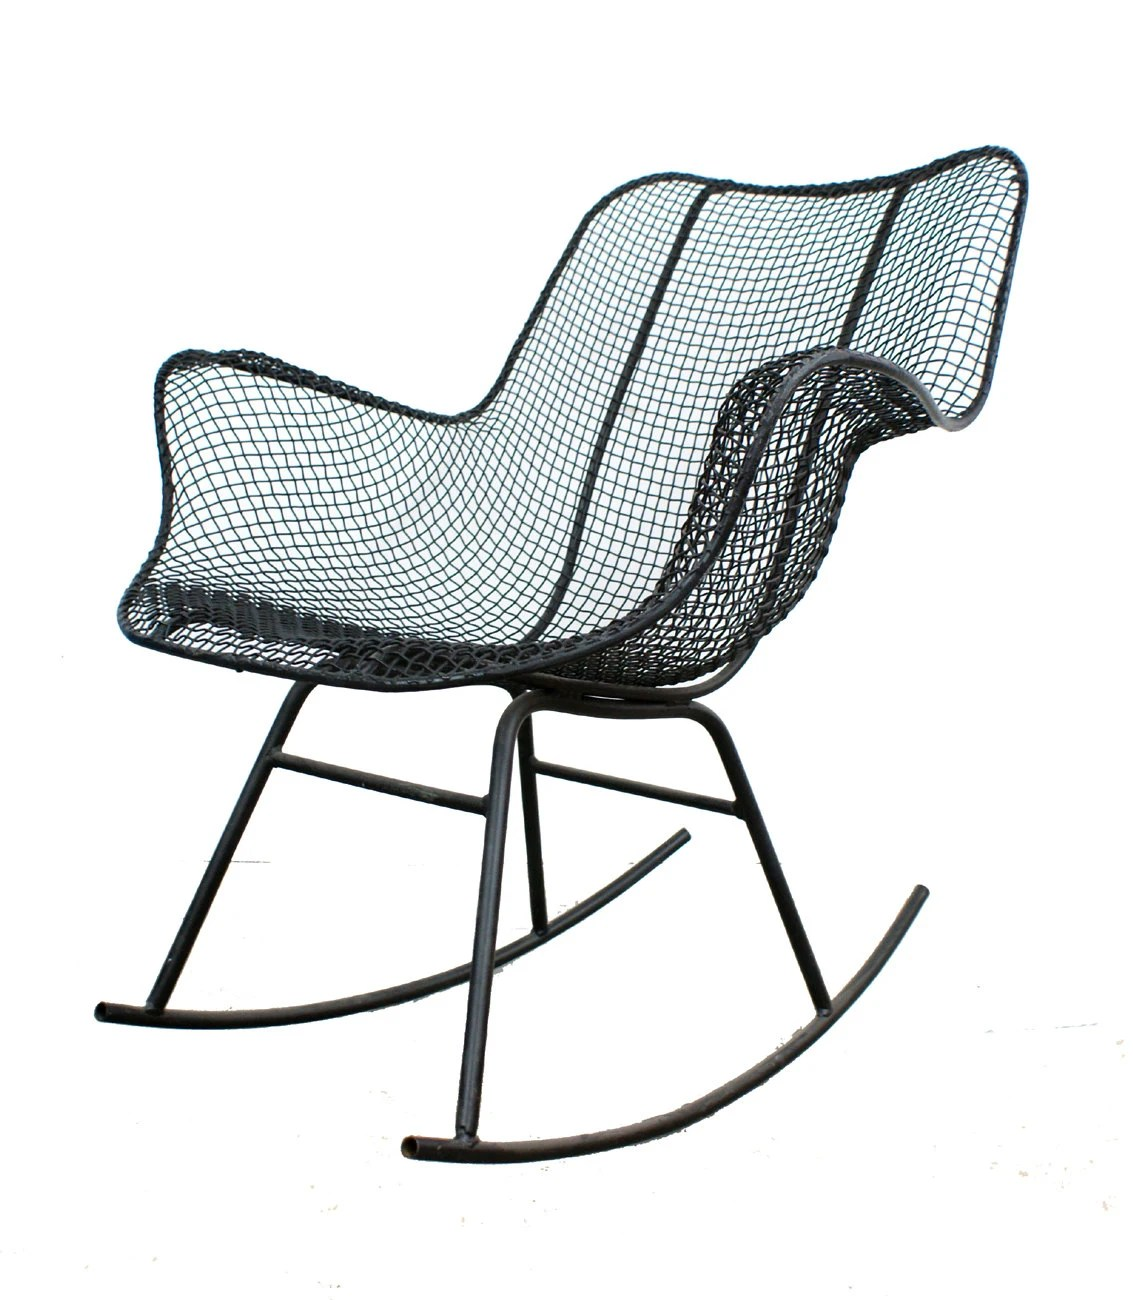 mid century rocker chair patio replacement parts woodard sculptura rocking modern eames on